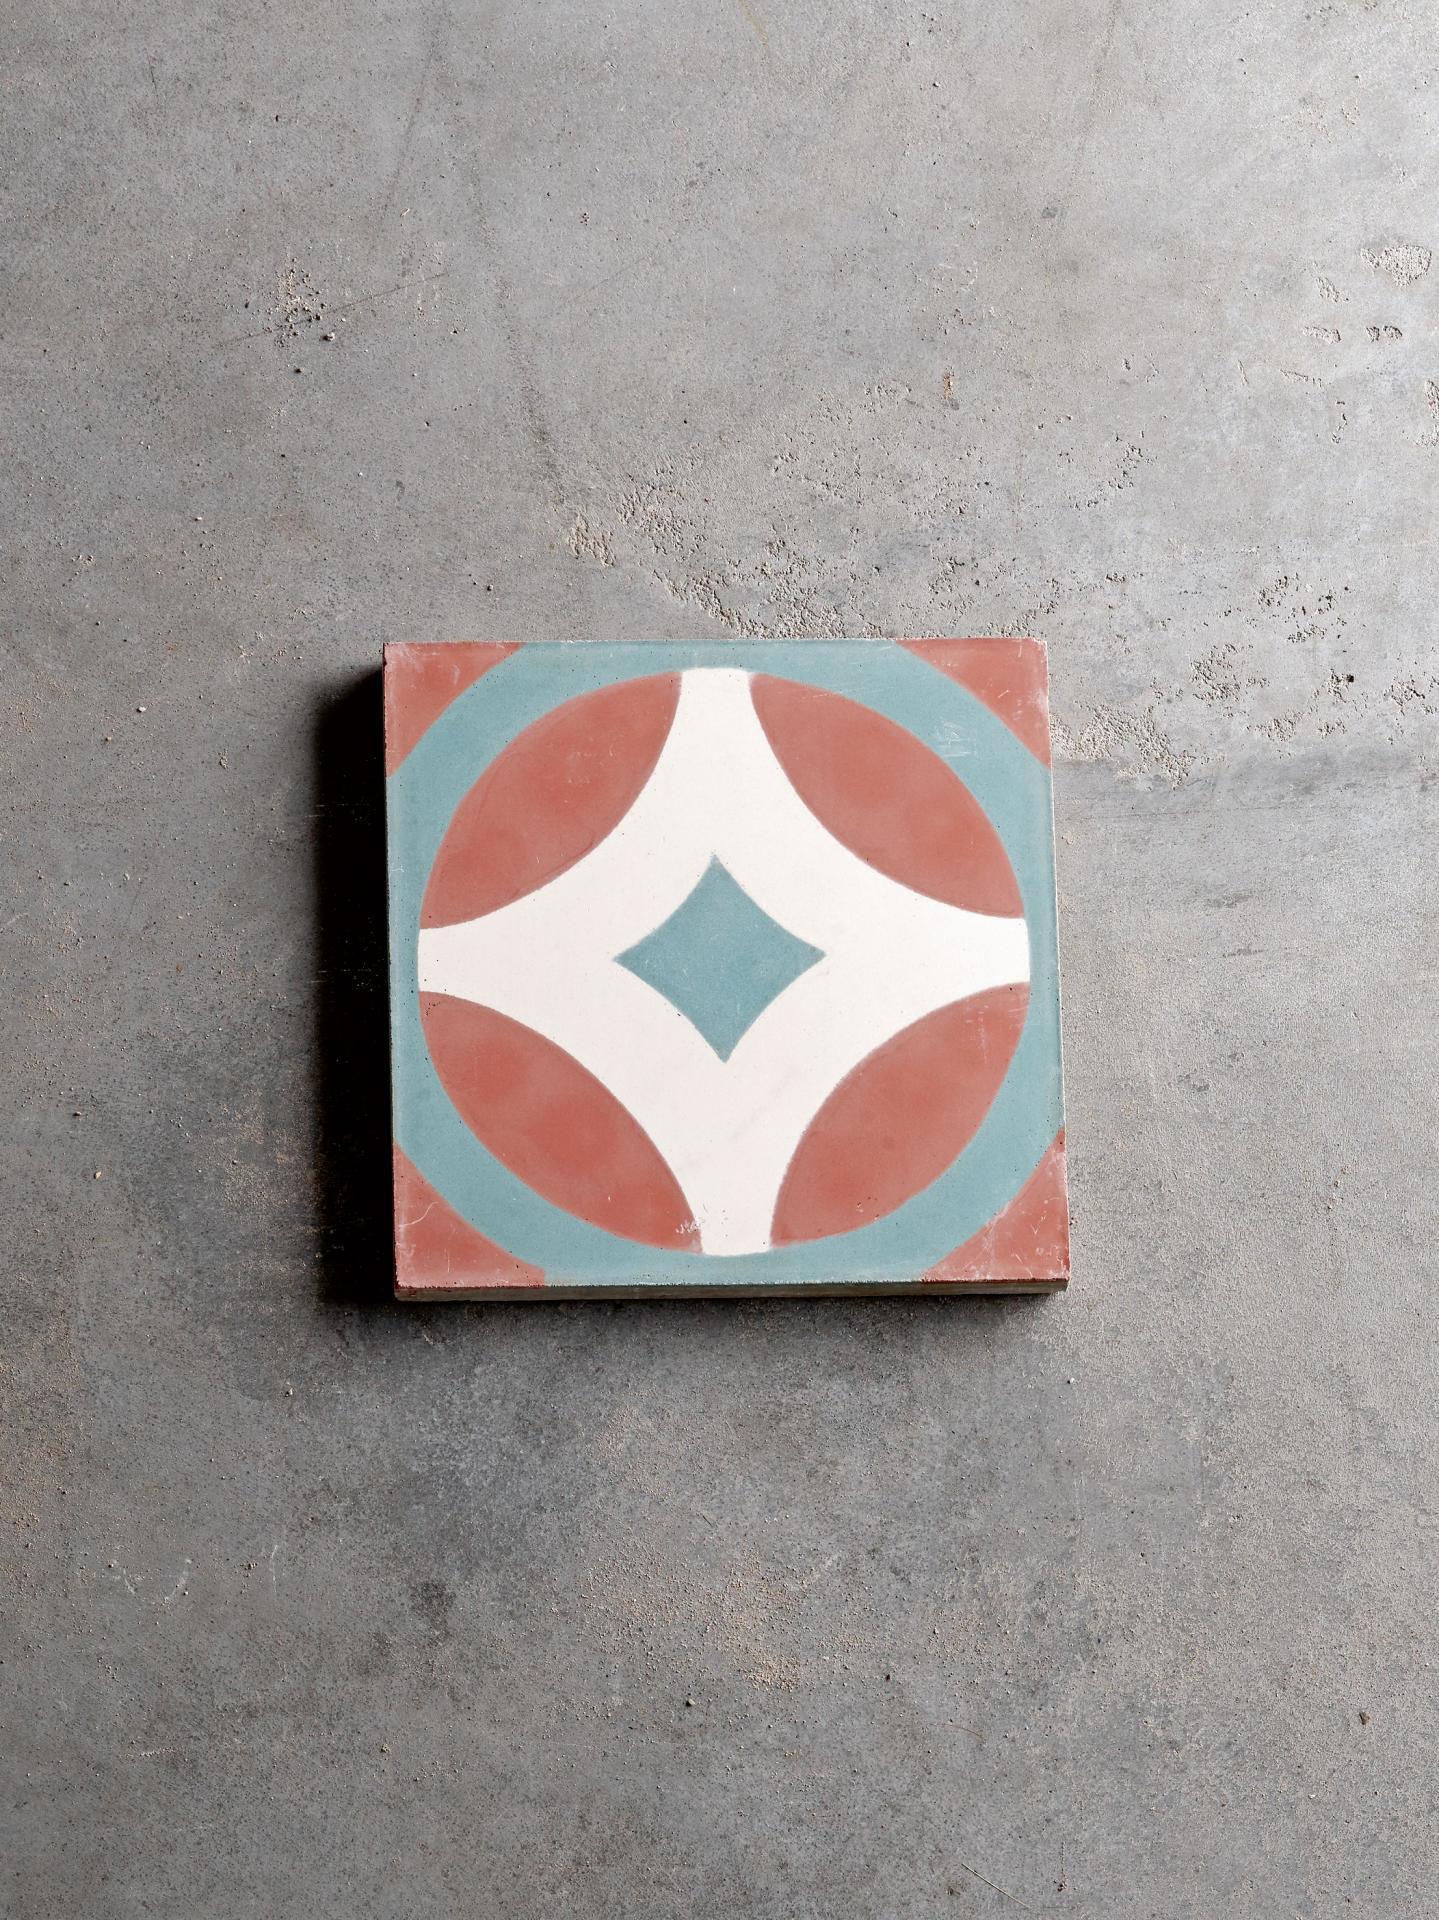 Tine K Home Cementová kachle Sign Aqua, modrá barva, oranžová barva, multi barva, beton